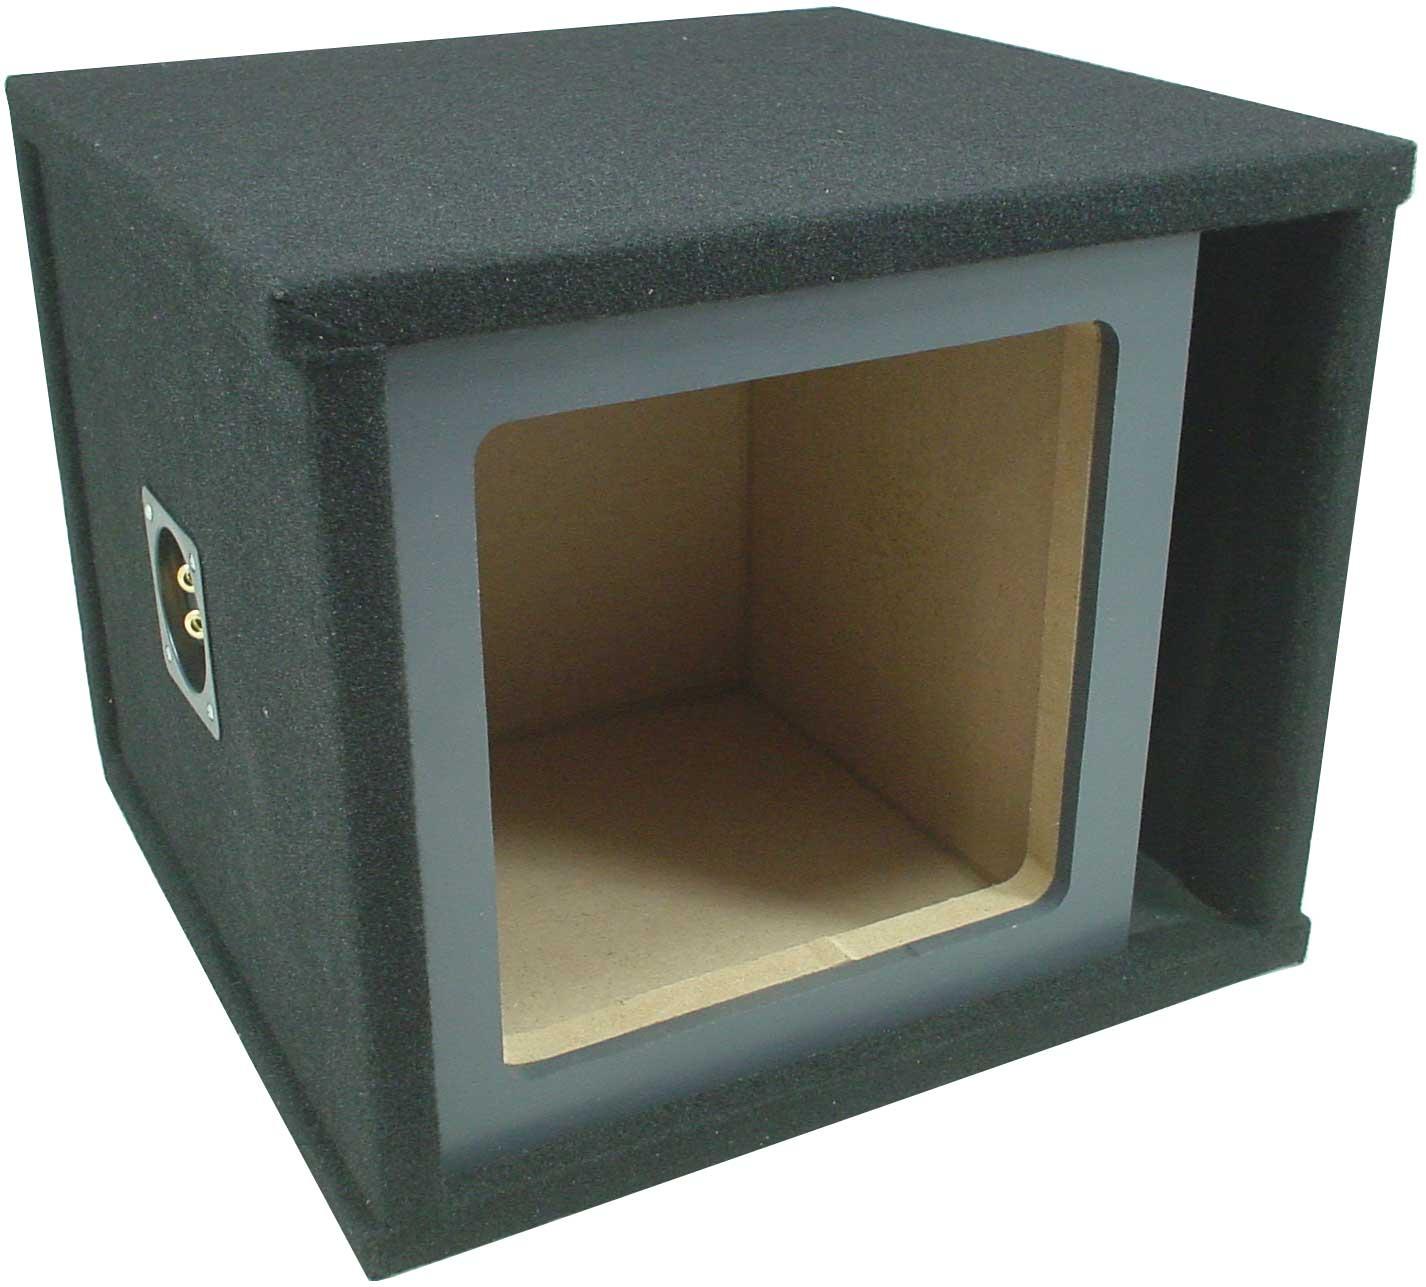 single kicker square 10 slot vented paintable baffle. Black Bedroom Furniture Sets. Home Design Ideas